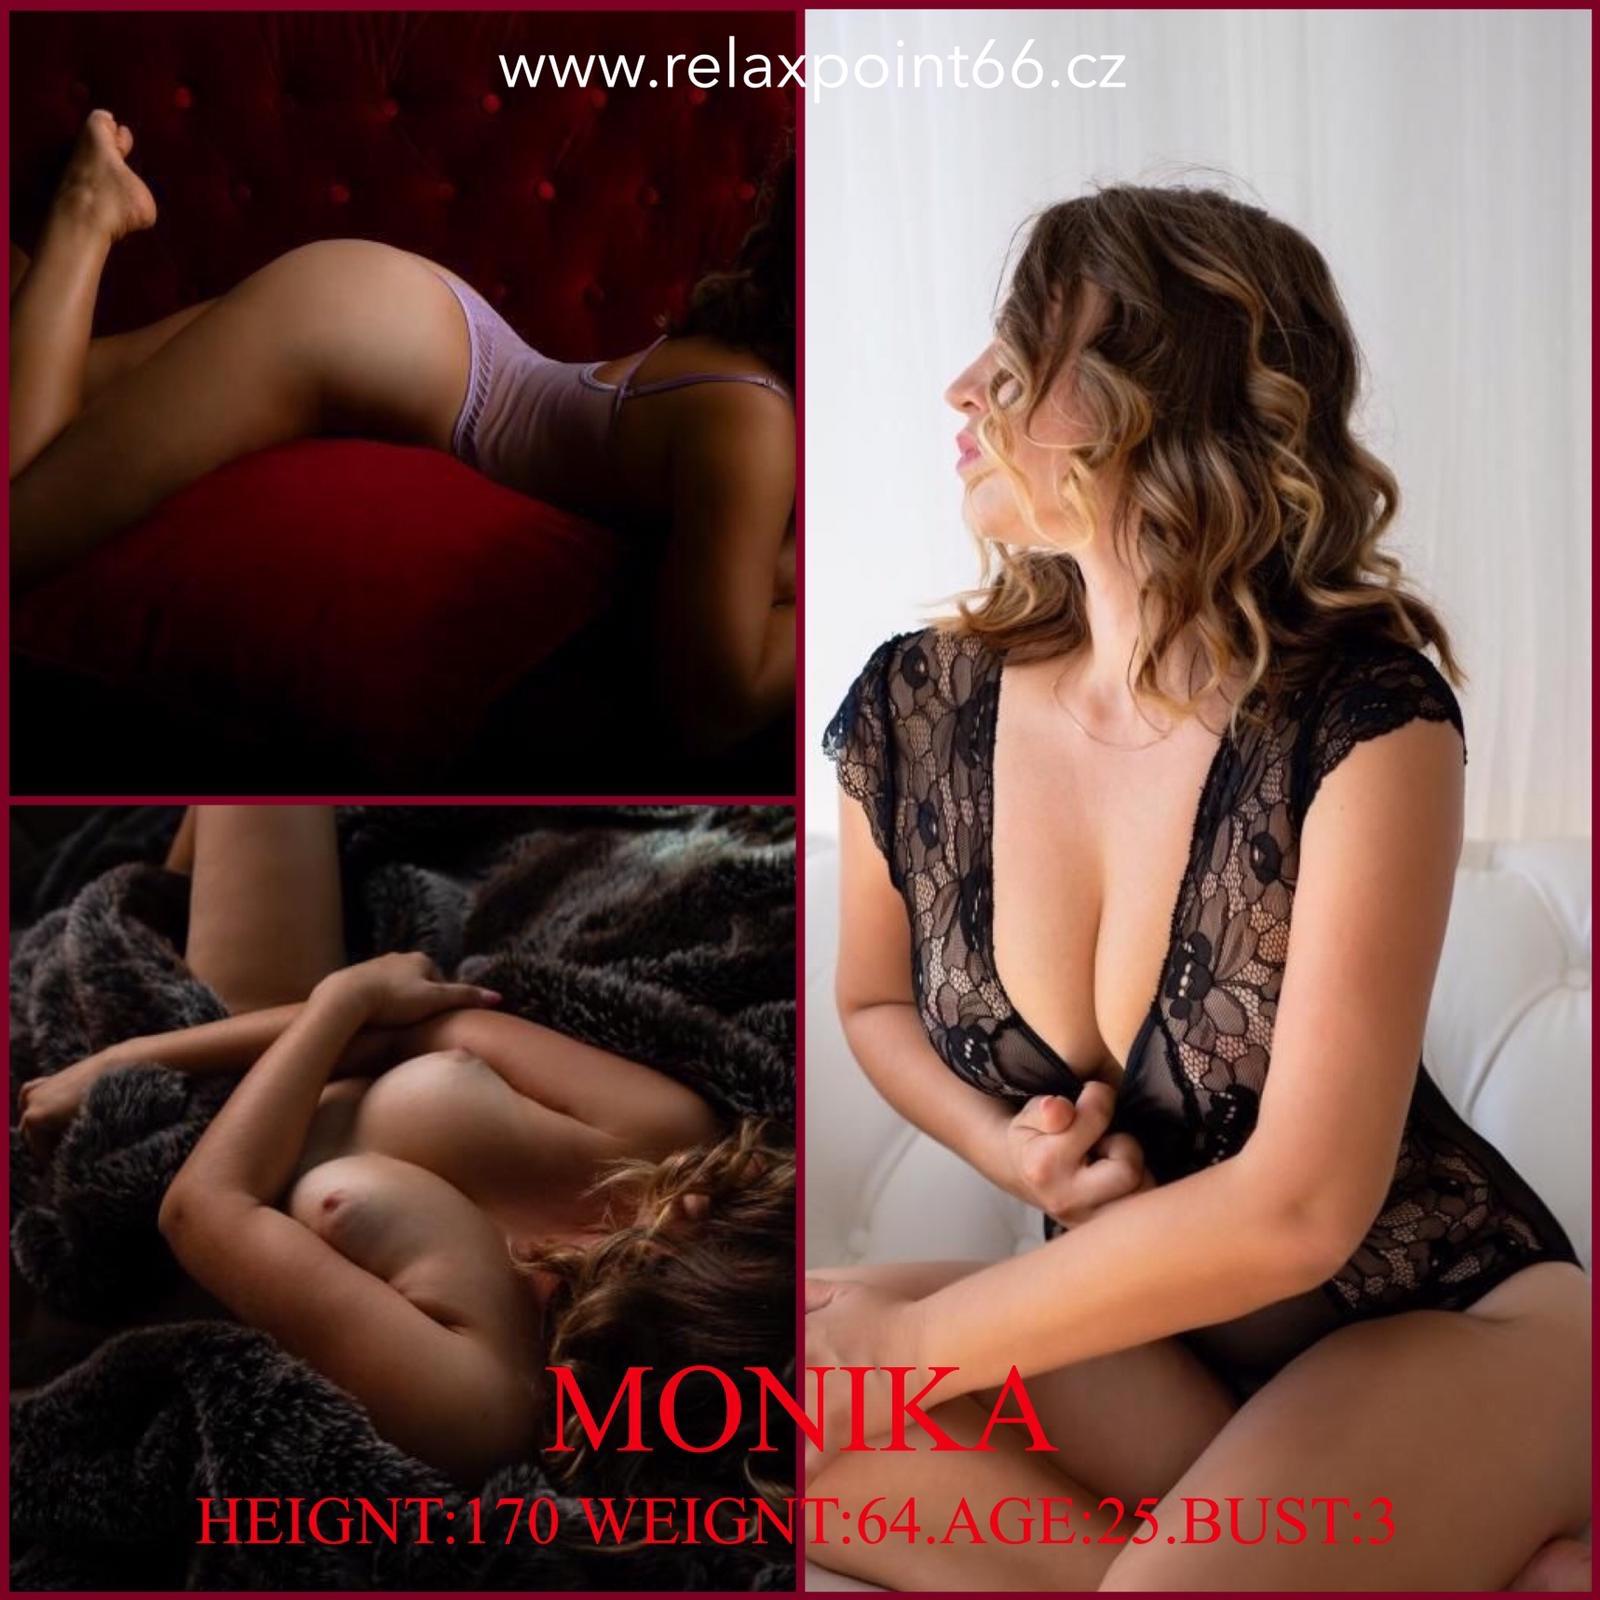 Monika erotic massage Prague